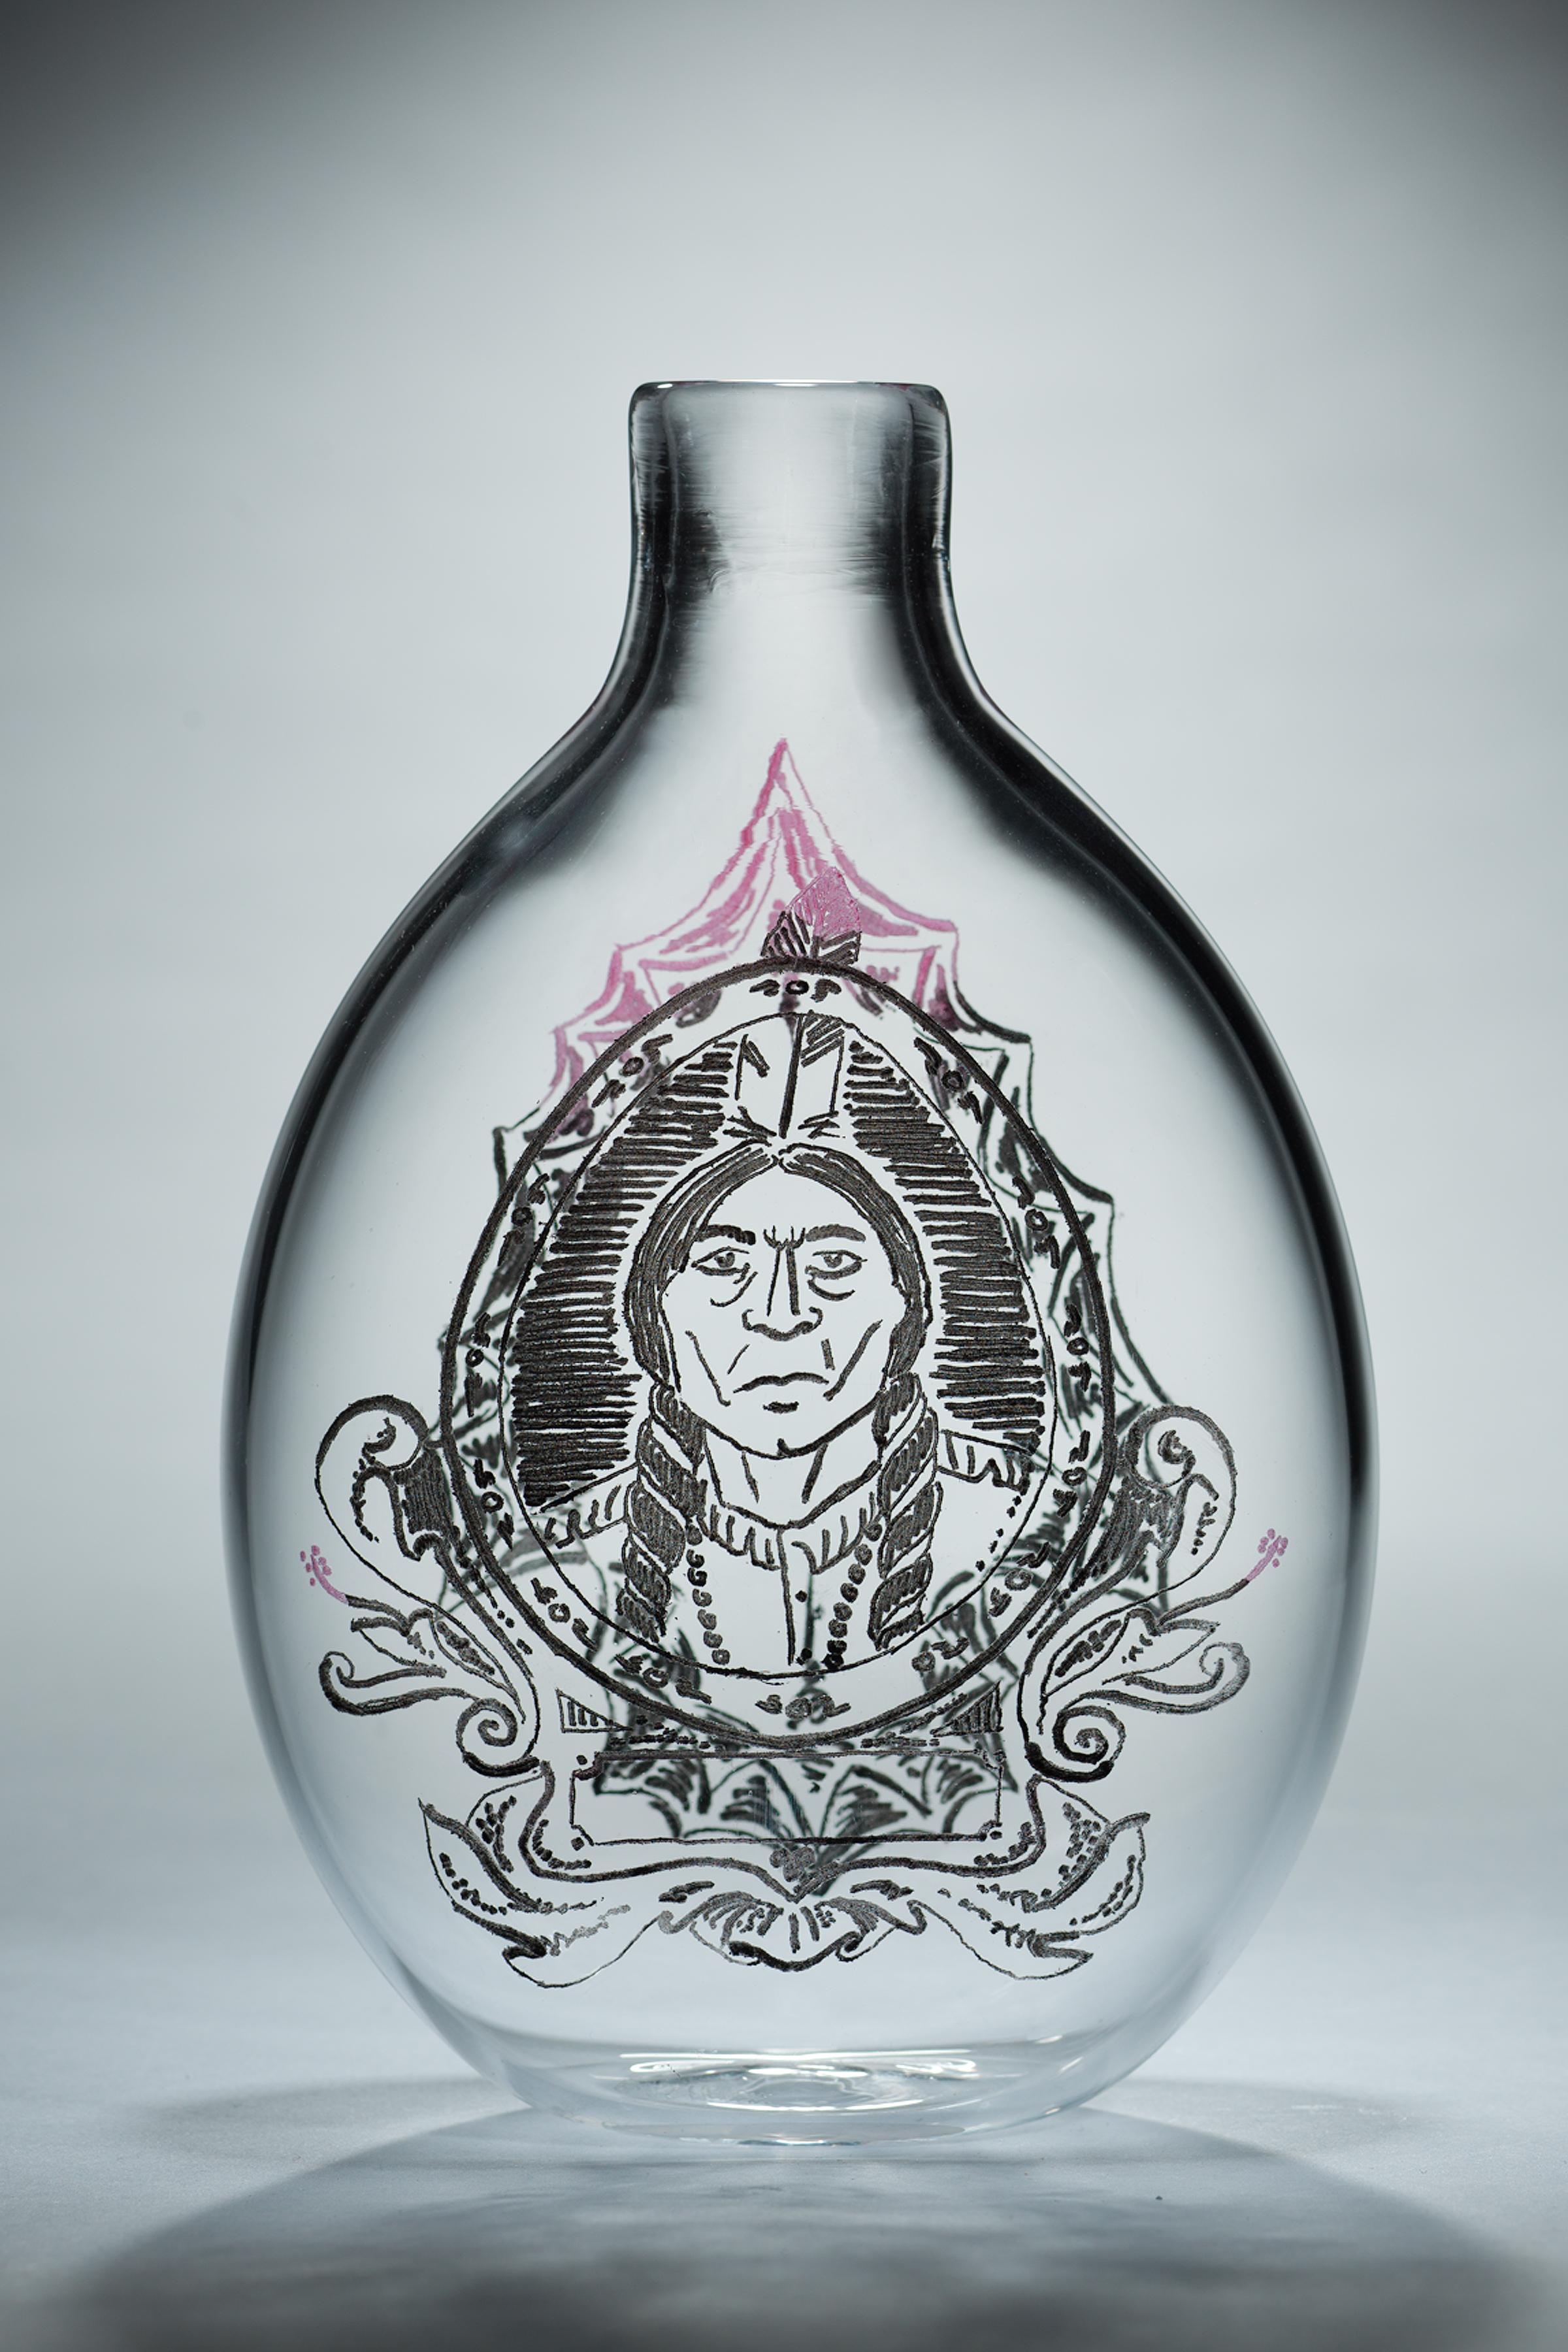 American Spirits, Chief Sitting Bull